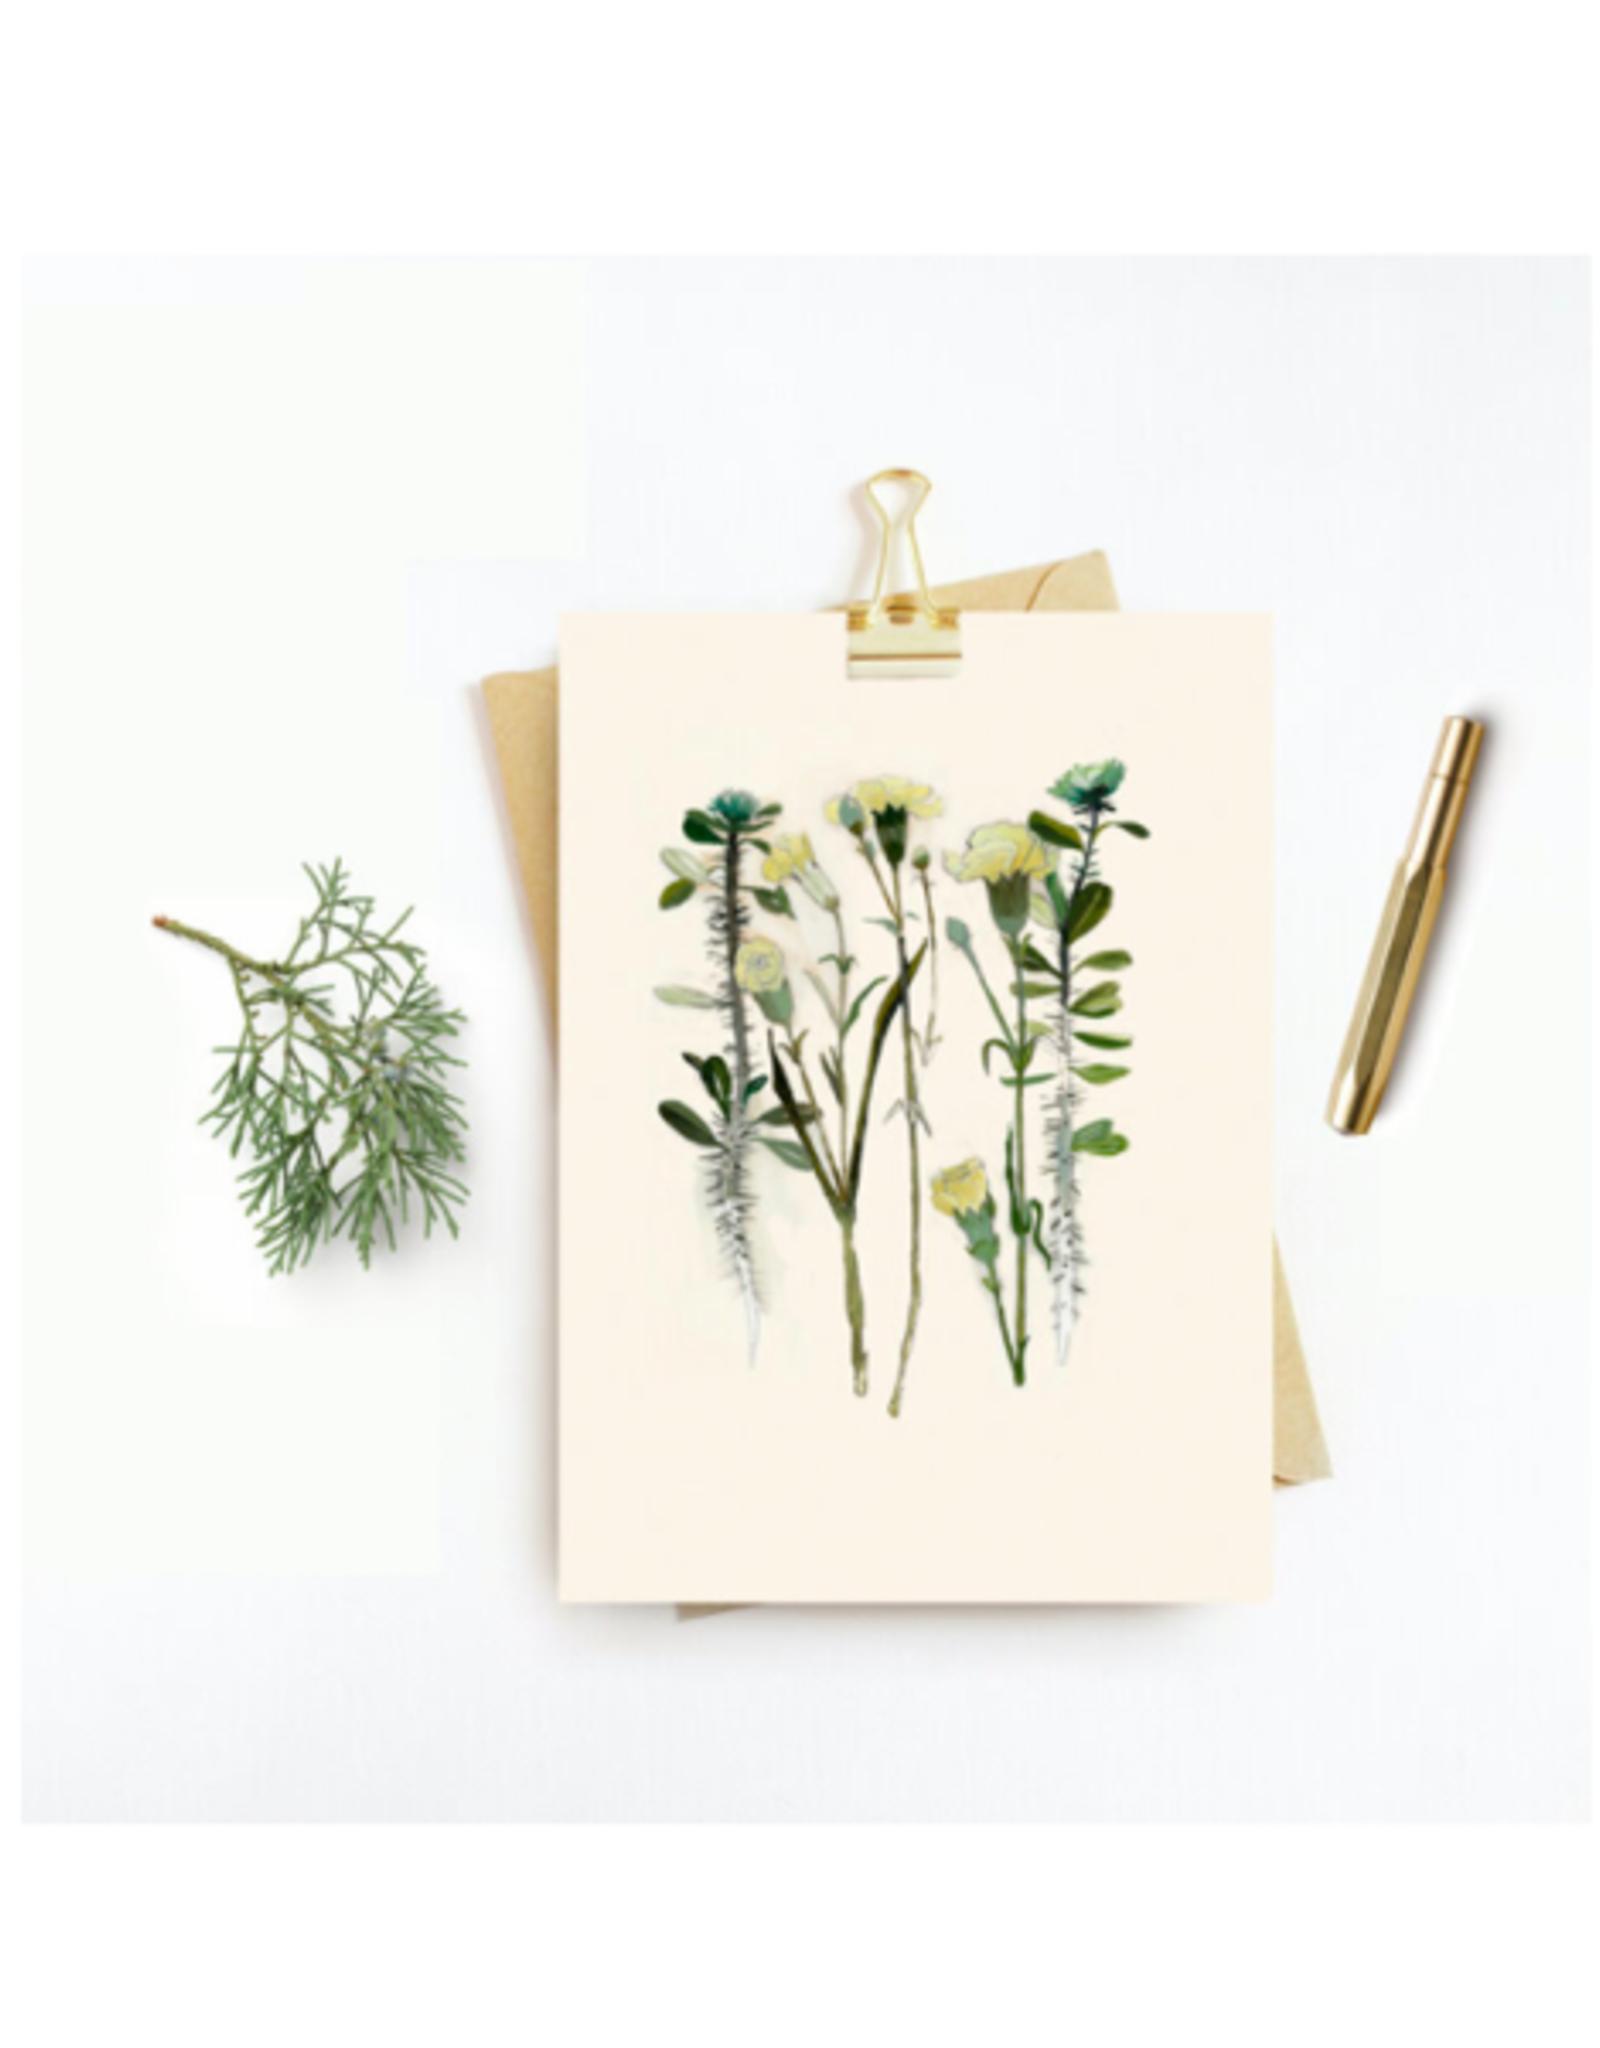 "Briana Corr Scott - Card/Thorny Rose & Carnation, 4 x 6"""